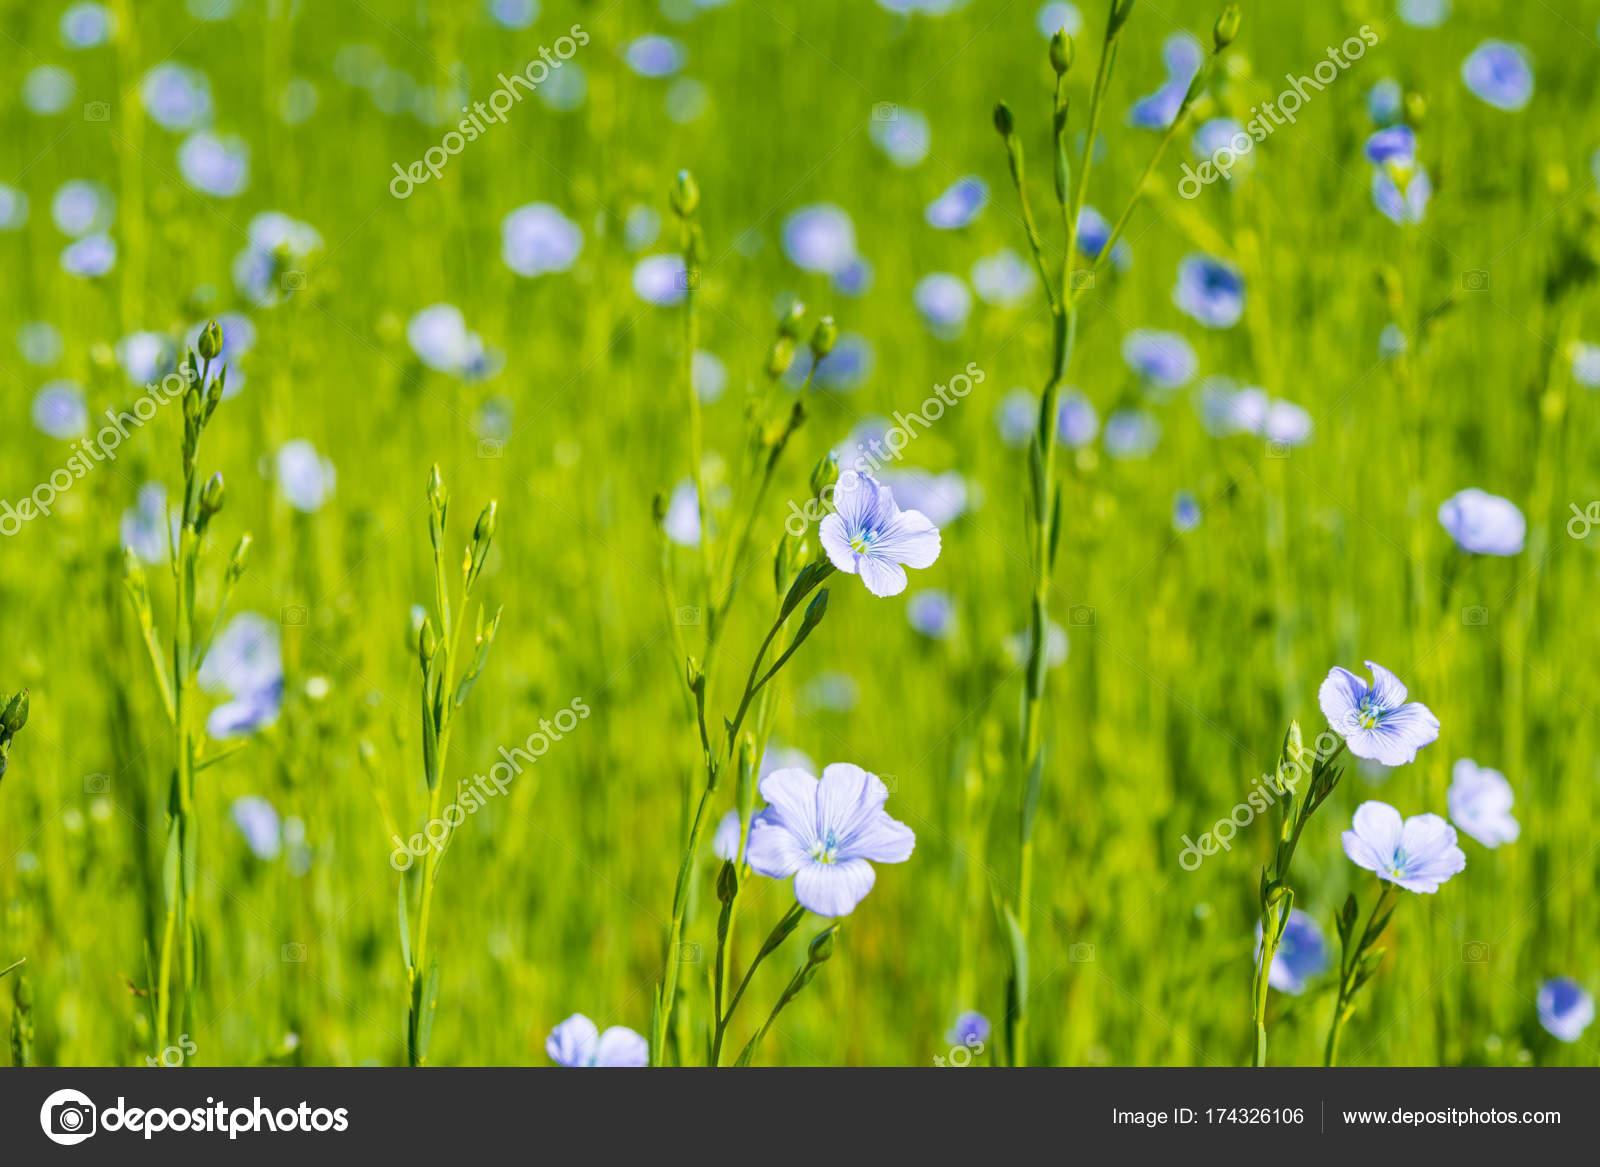 bright green field flax blooming spring blue flowers flax closeup